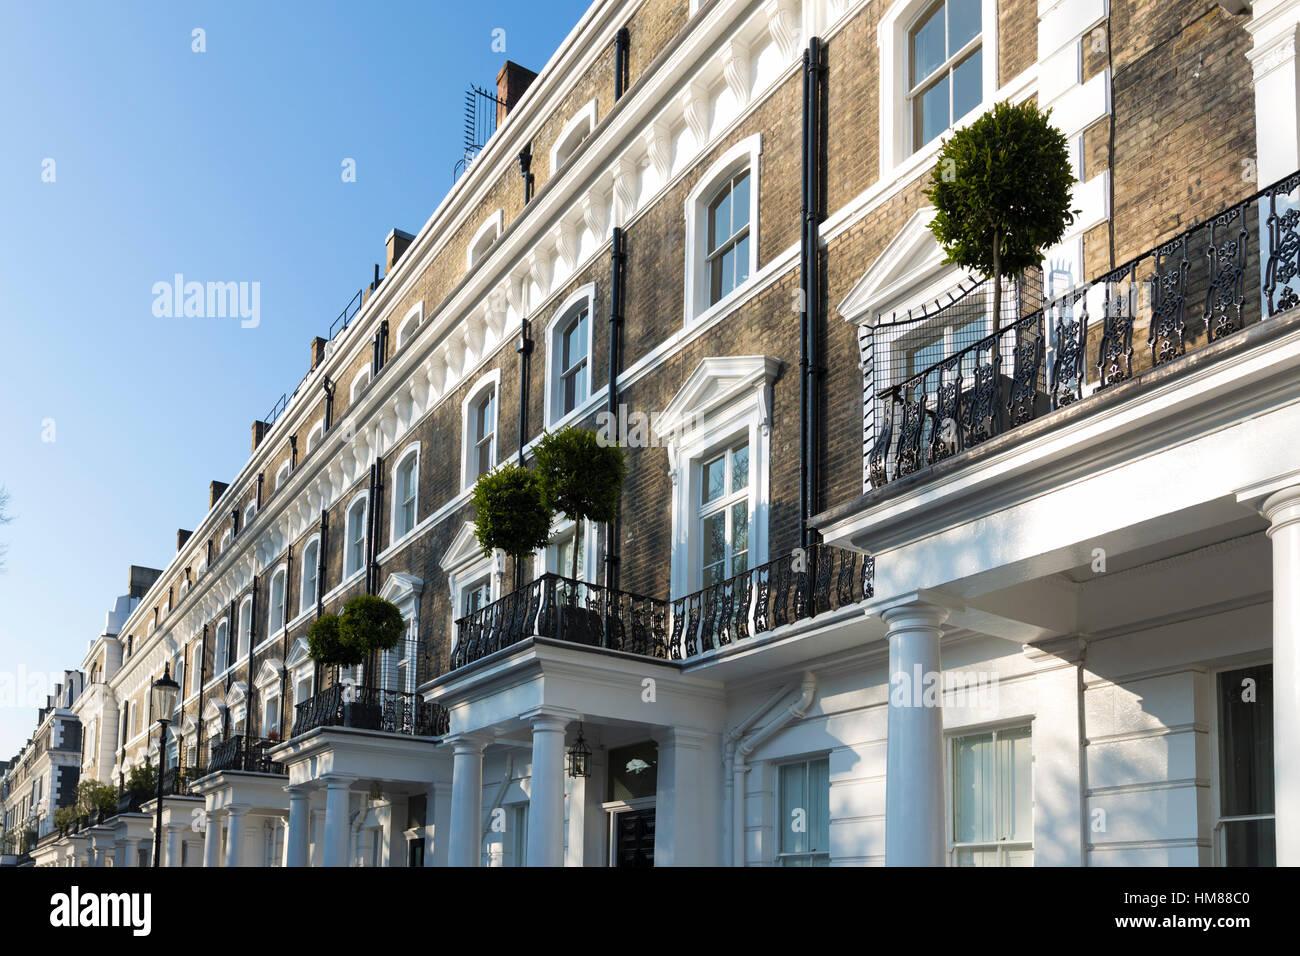 London Property in South kensington UK Stock Photo